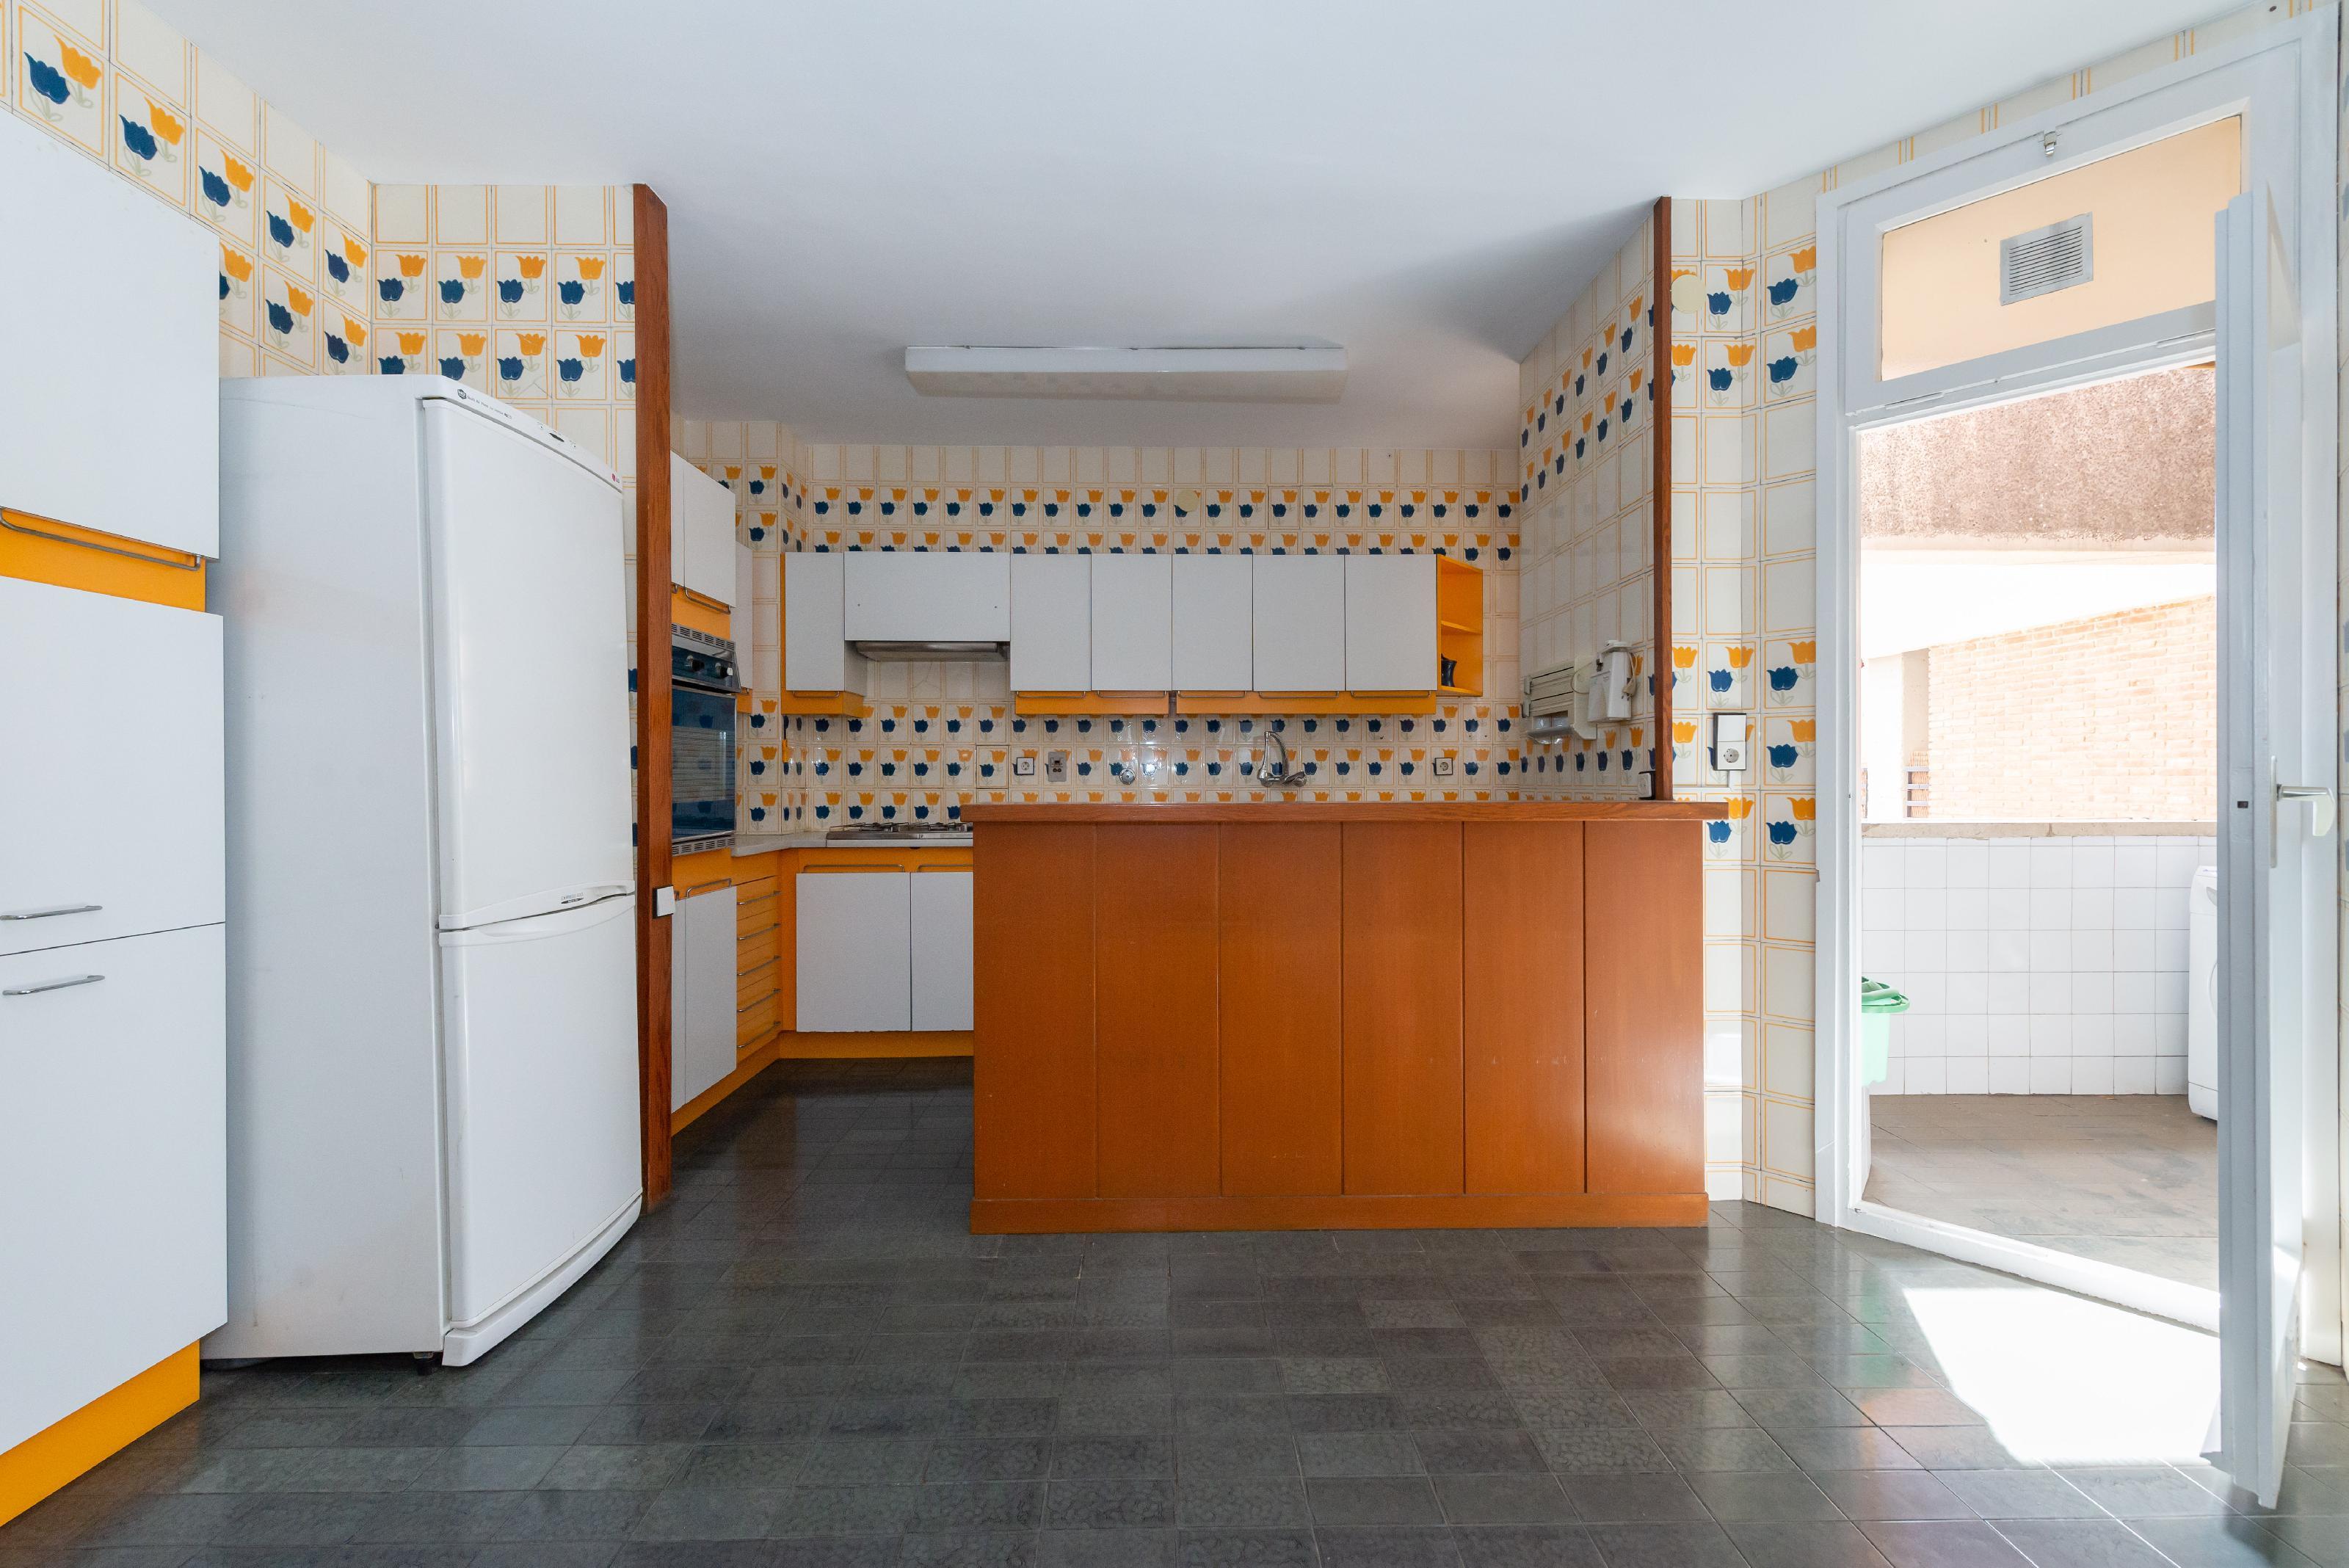 253470 Flat for sale in Sarrià-Sant Gervasi, El Putxet and Farró 24